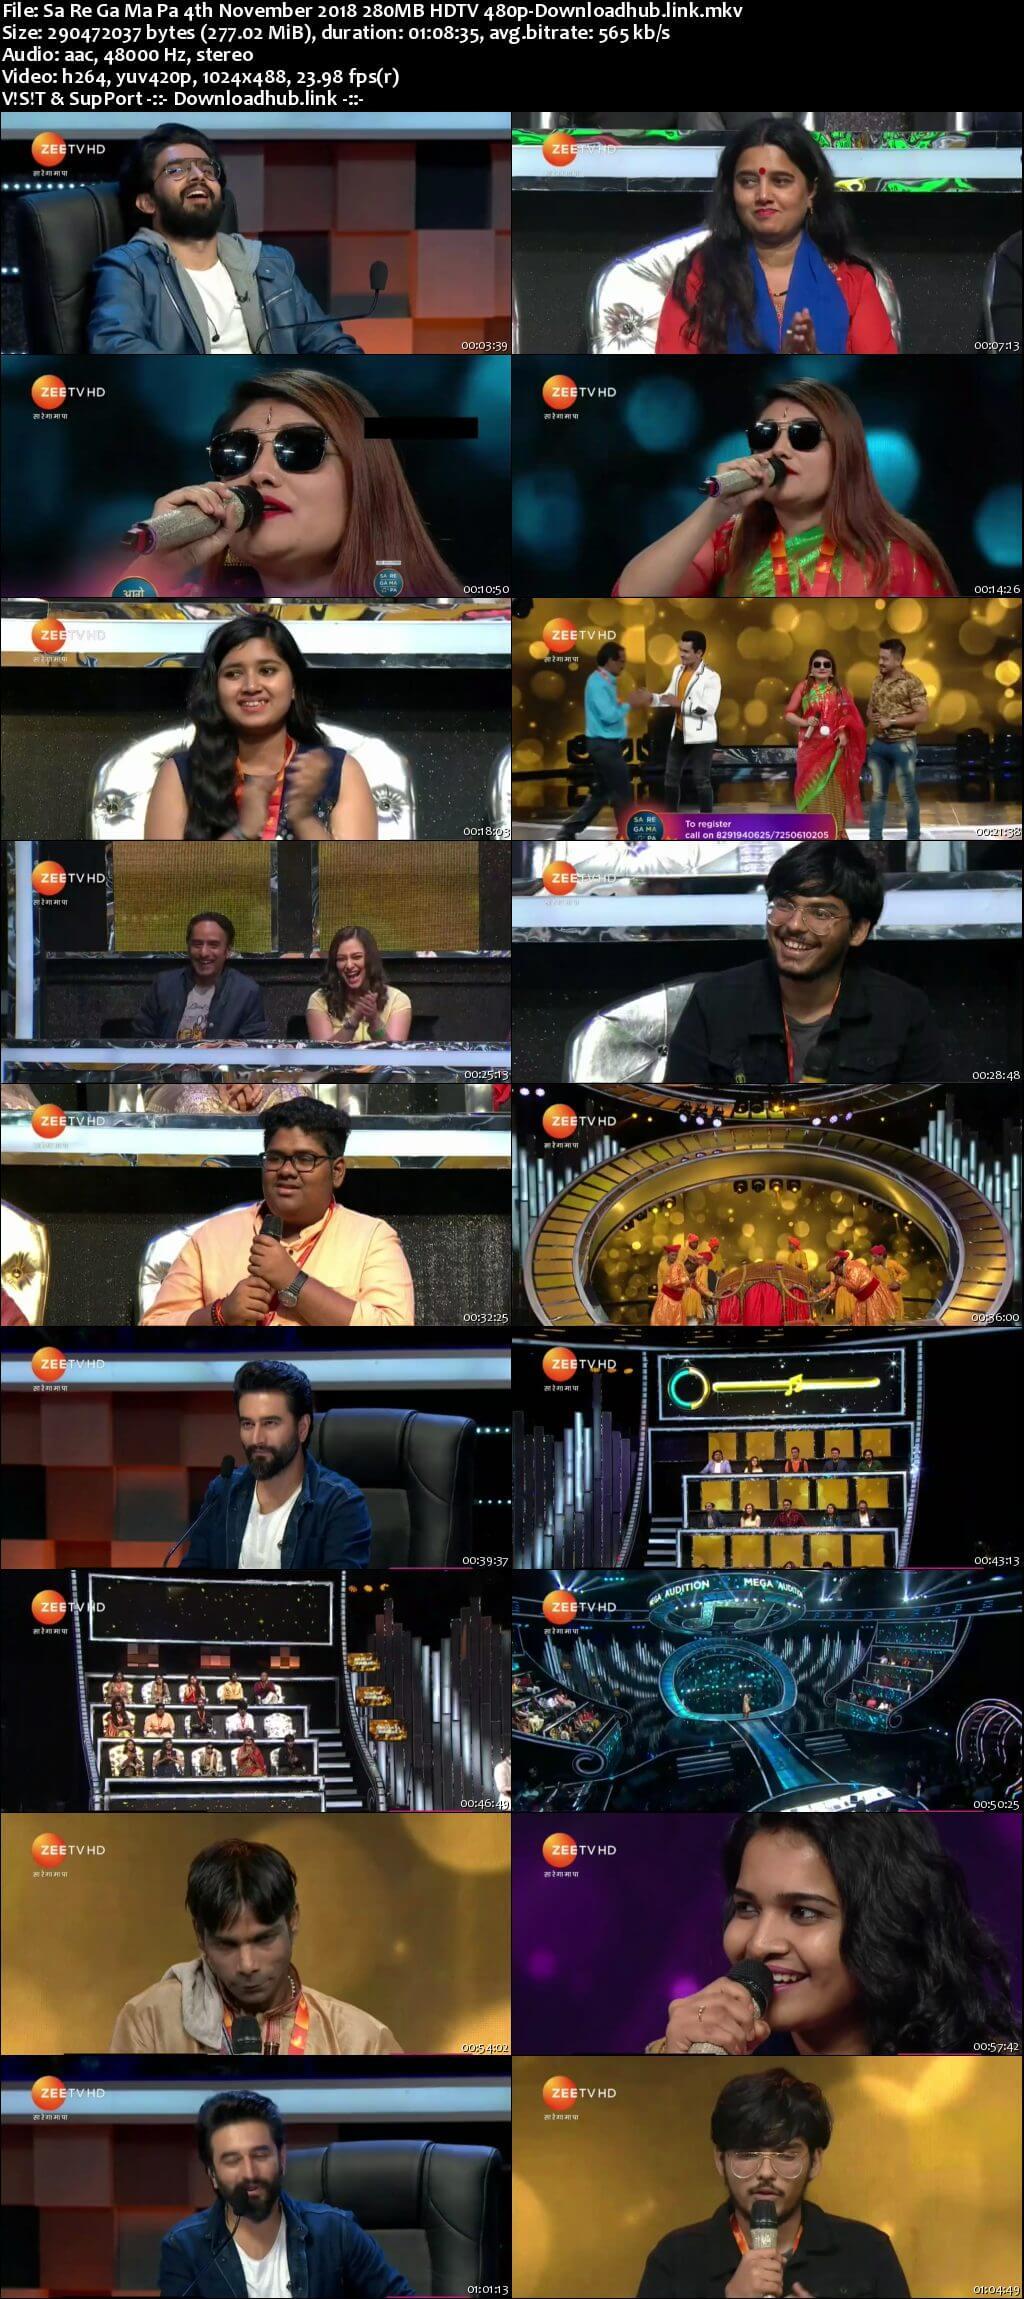 Sa Re Ga Ma Pa 04 November 2018 Episode 07 HDTV 480p